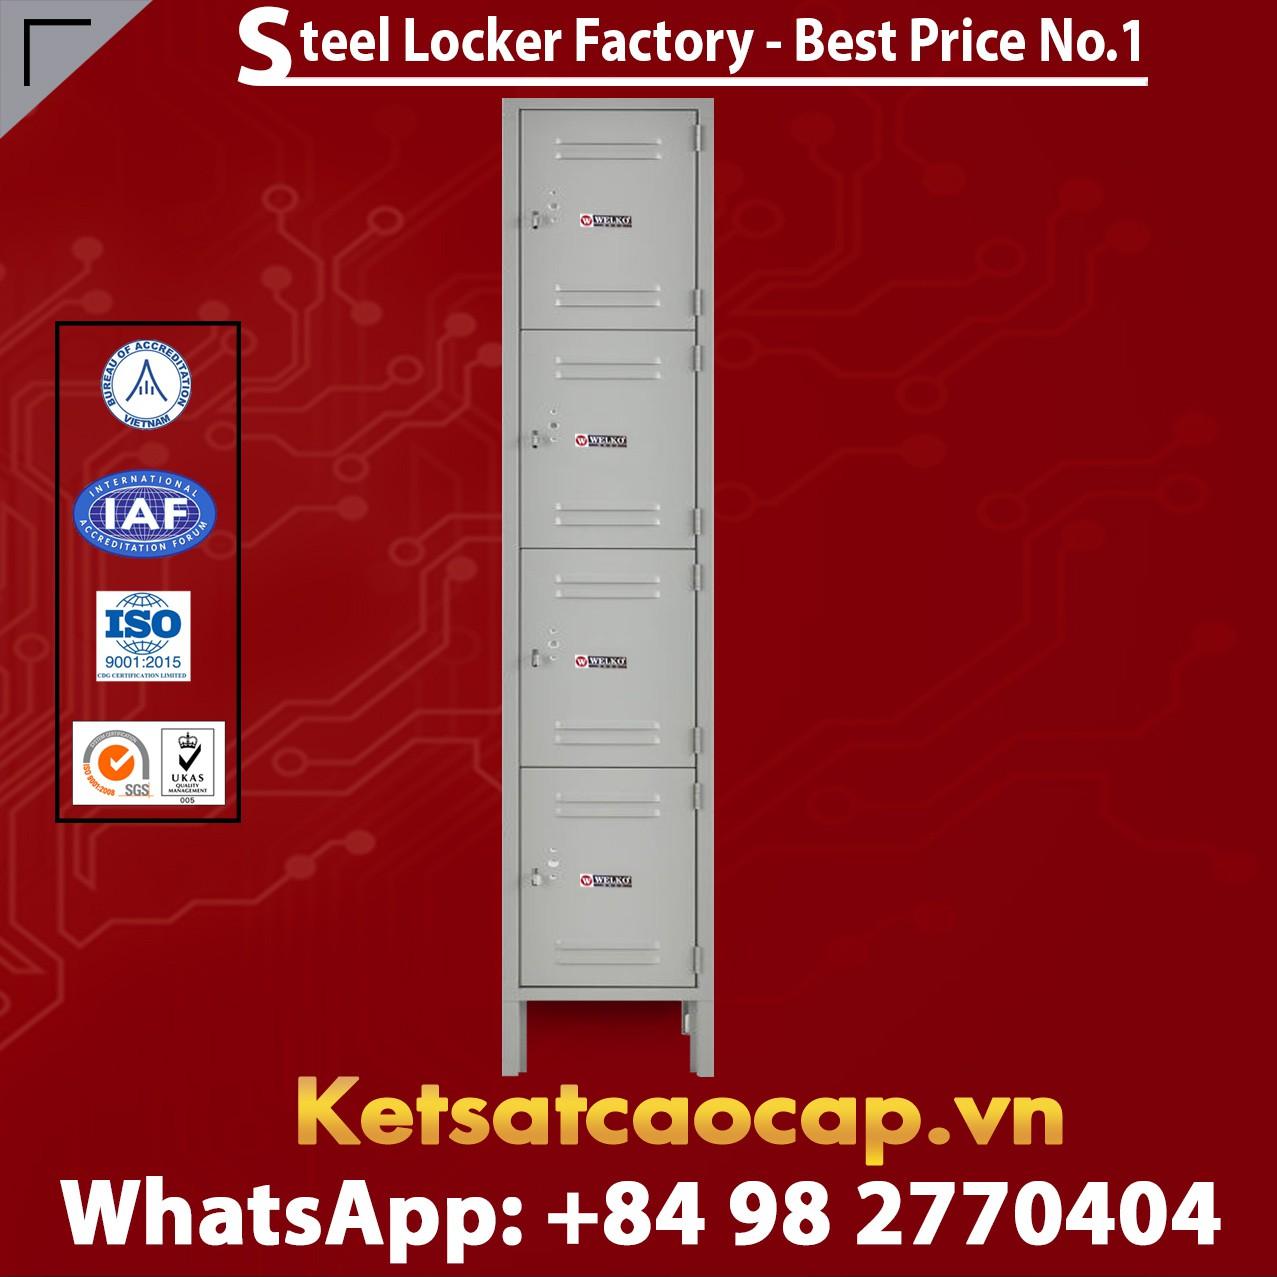 Steel Locker 4 Tier 12 x 15 x 18 4 Door Ready To Assemble Gray